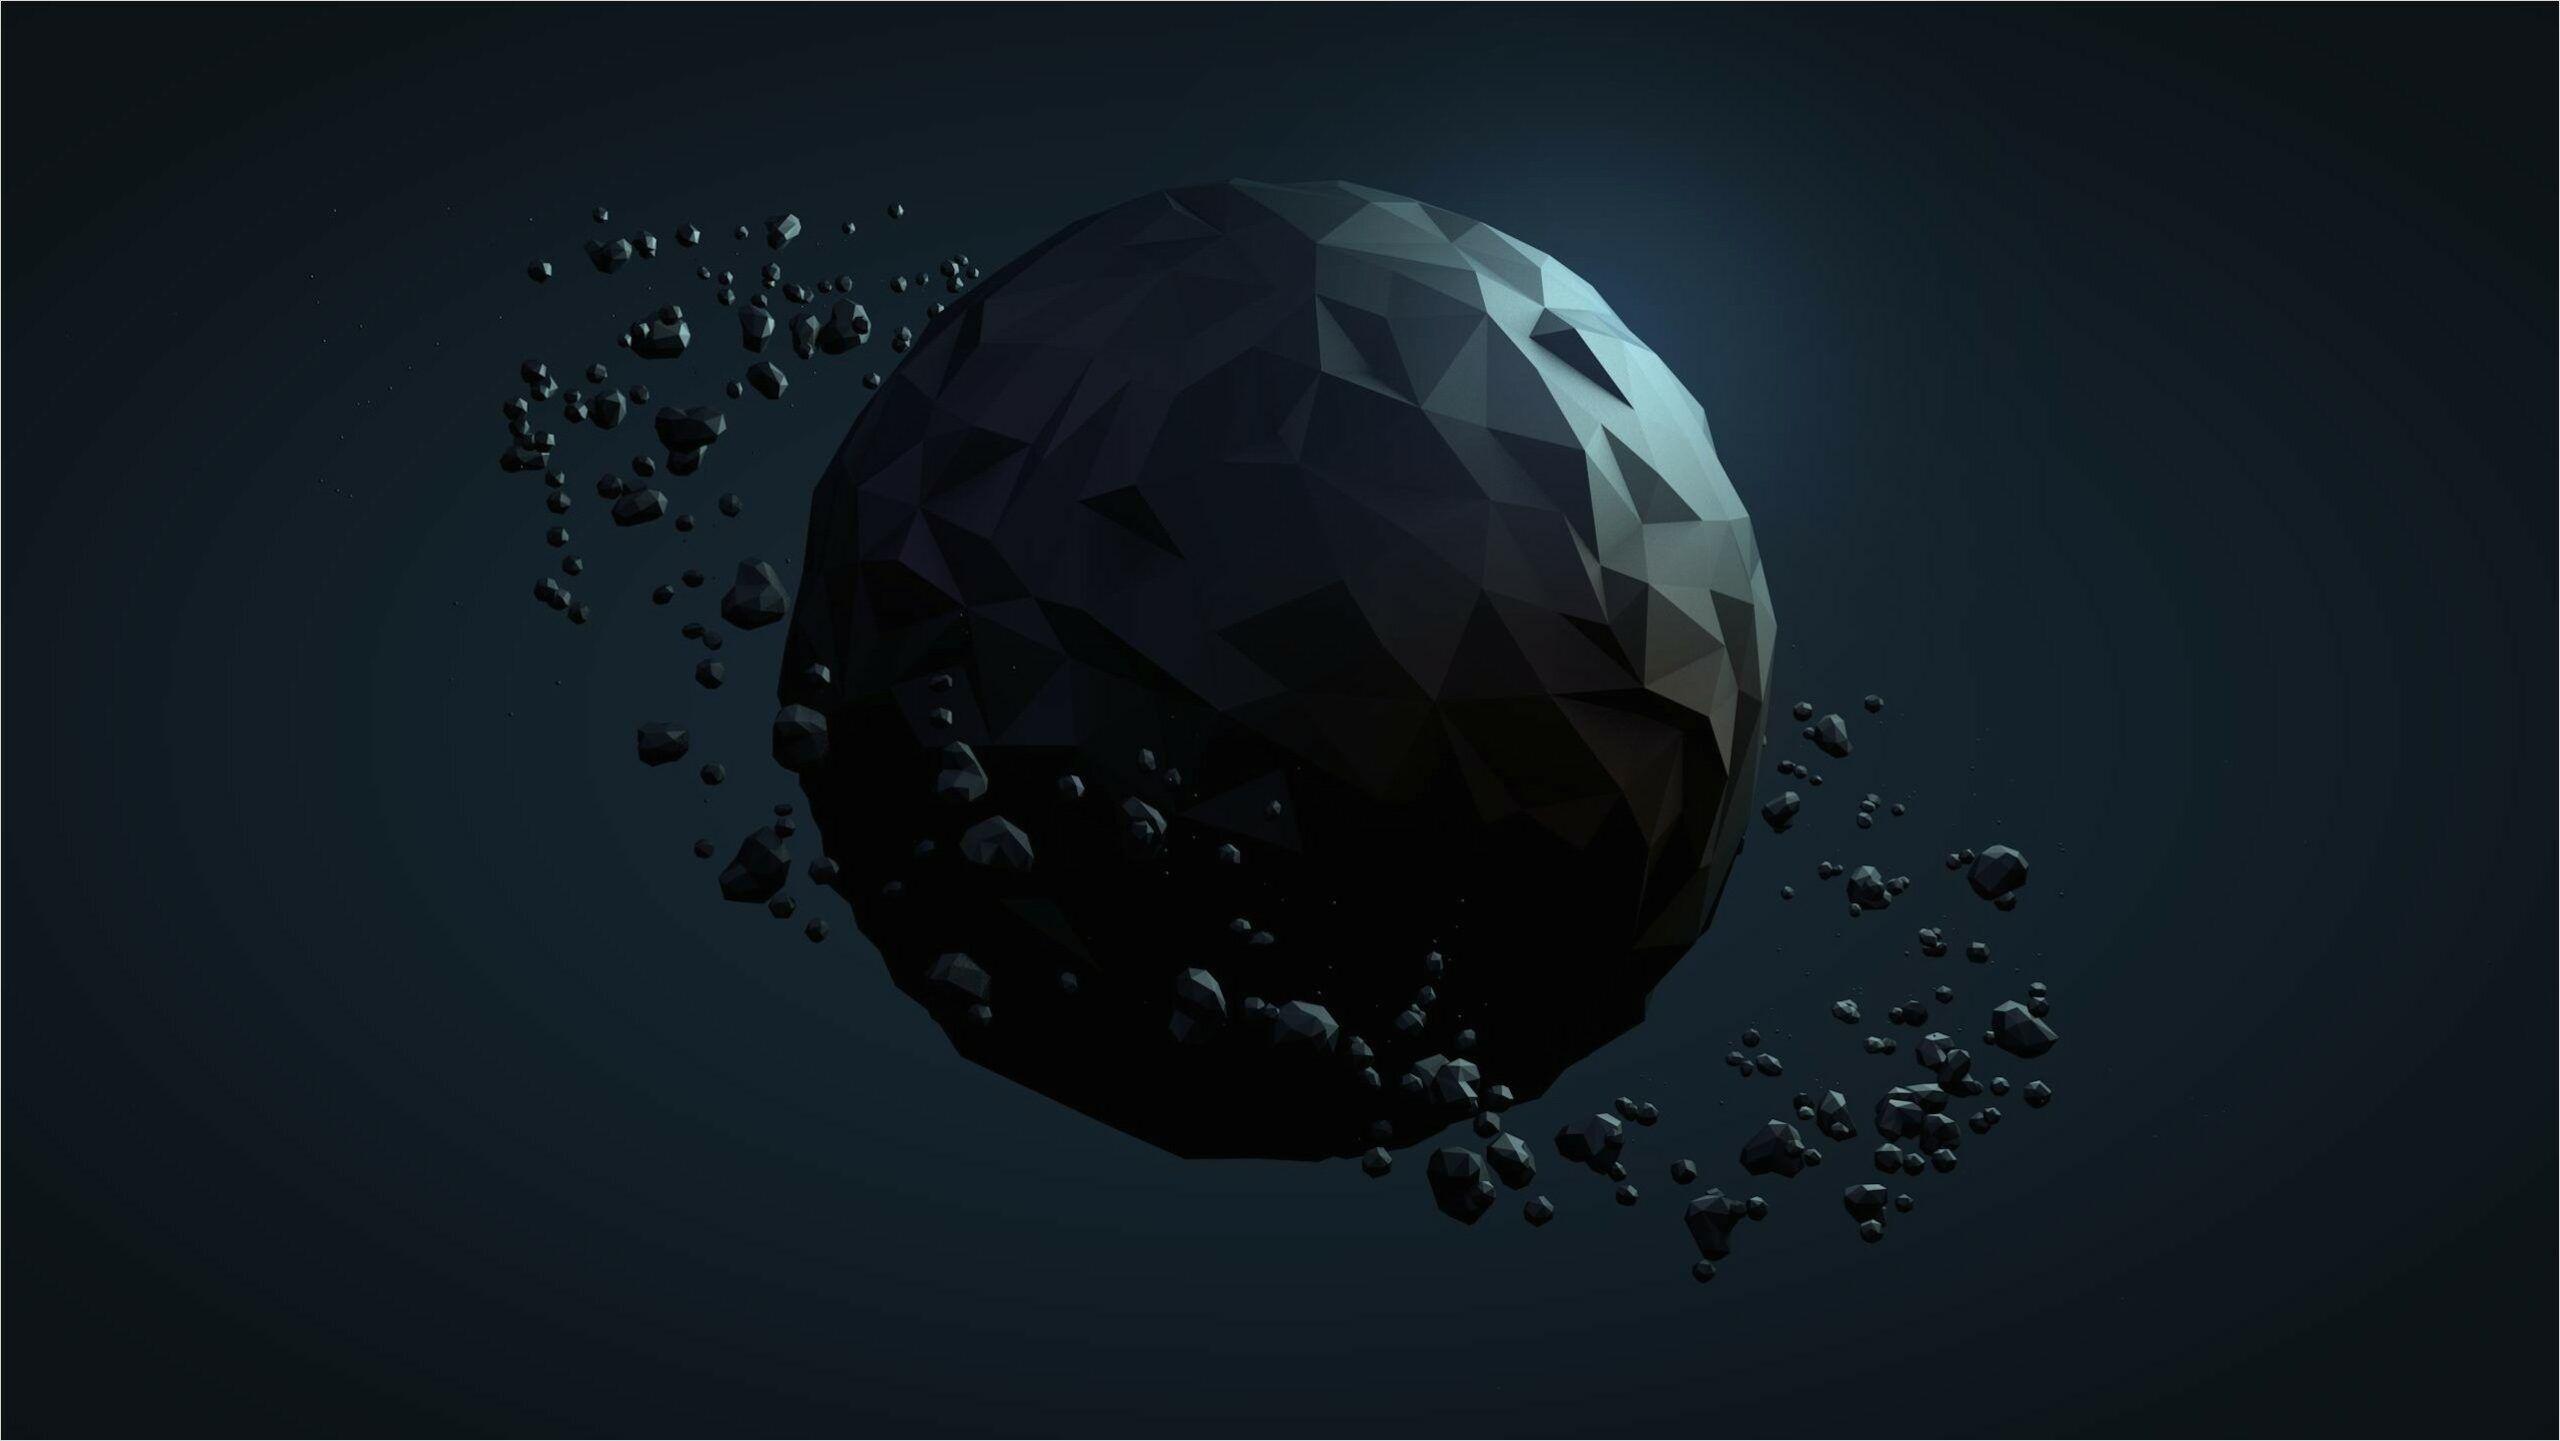 4k Polygon Wallpaper Imgur In 2020 Planets Wallpaper Polygon Art Low Poly